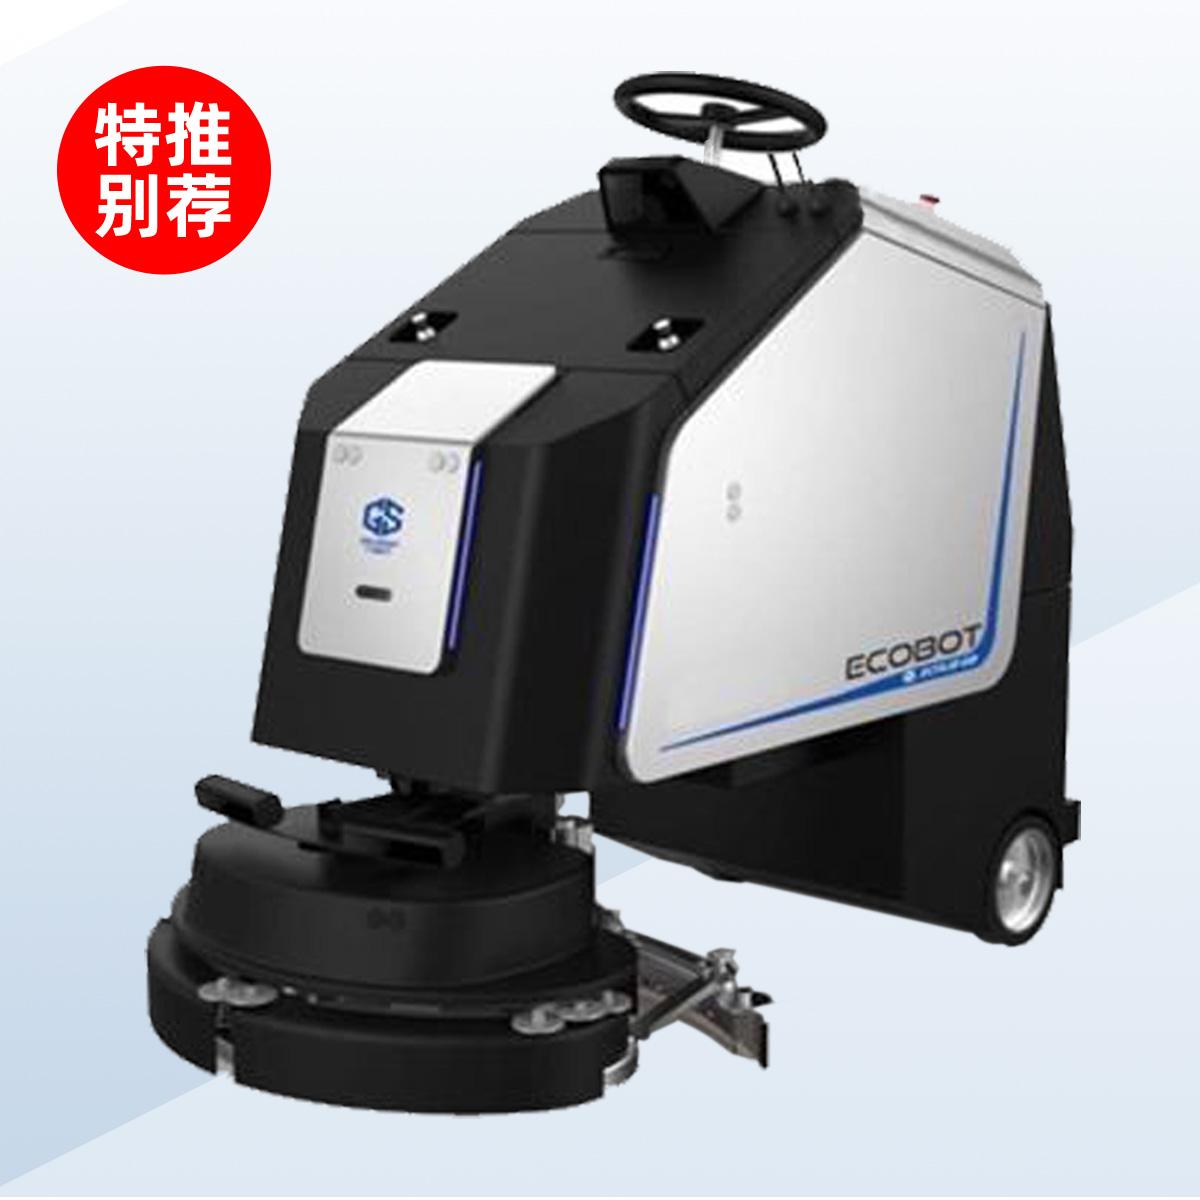 Ecobot Scrubber 75洗地机器人